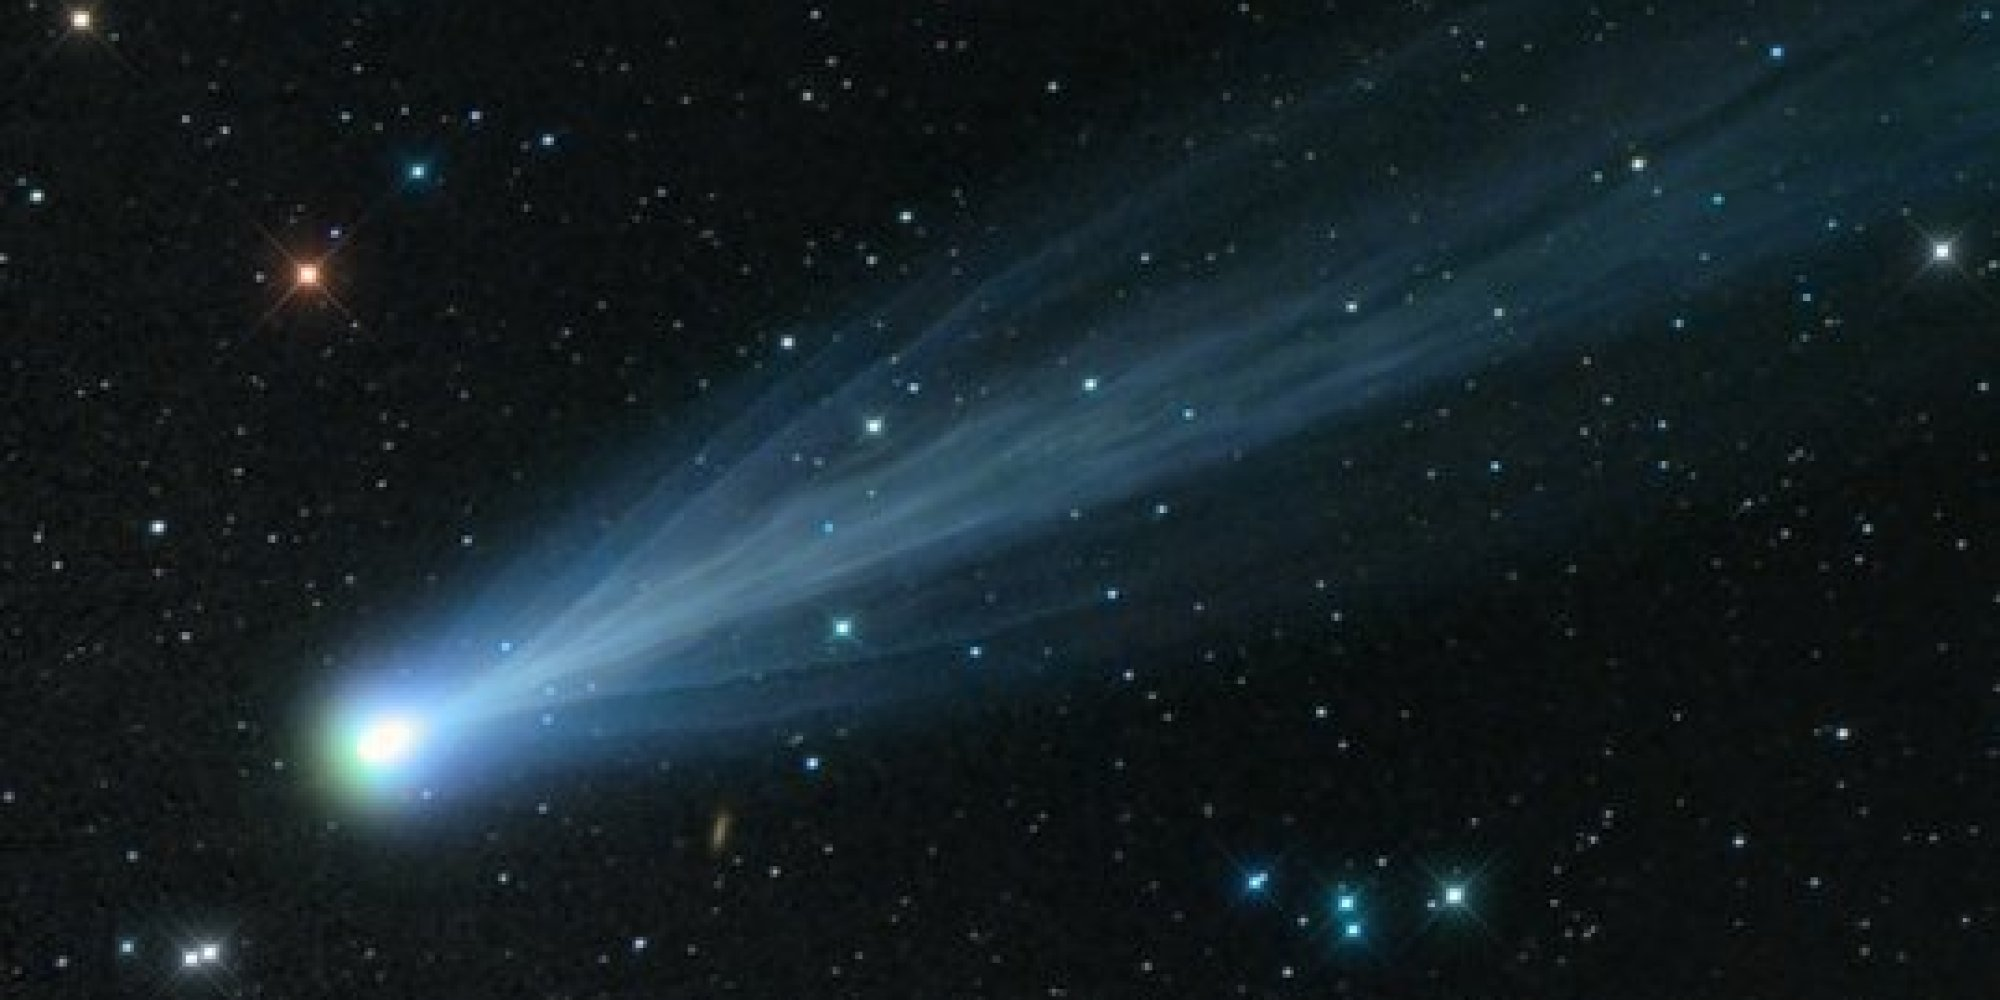 Comet ISON Is Dead, Nasa Confirms